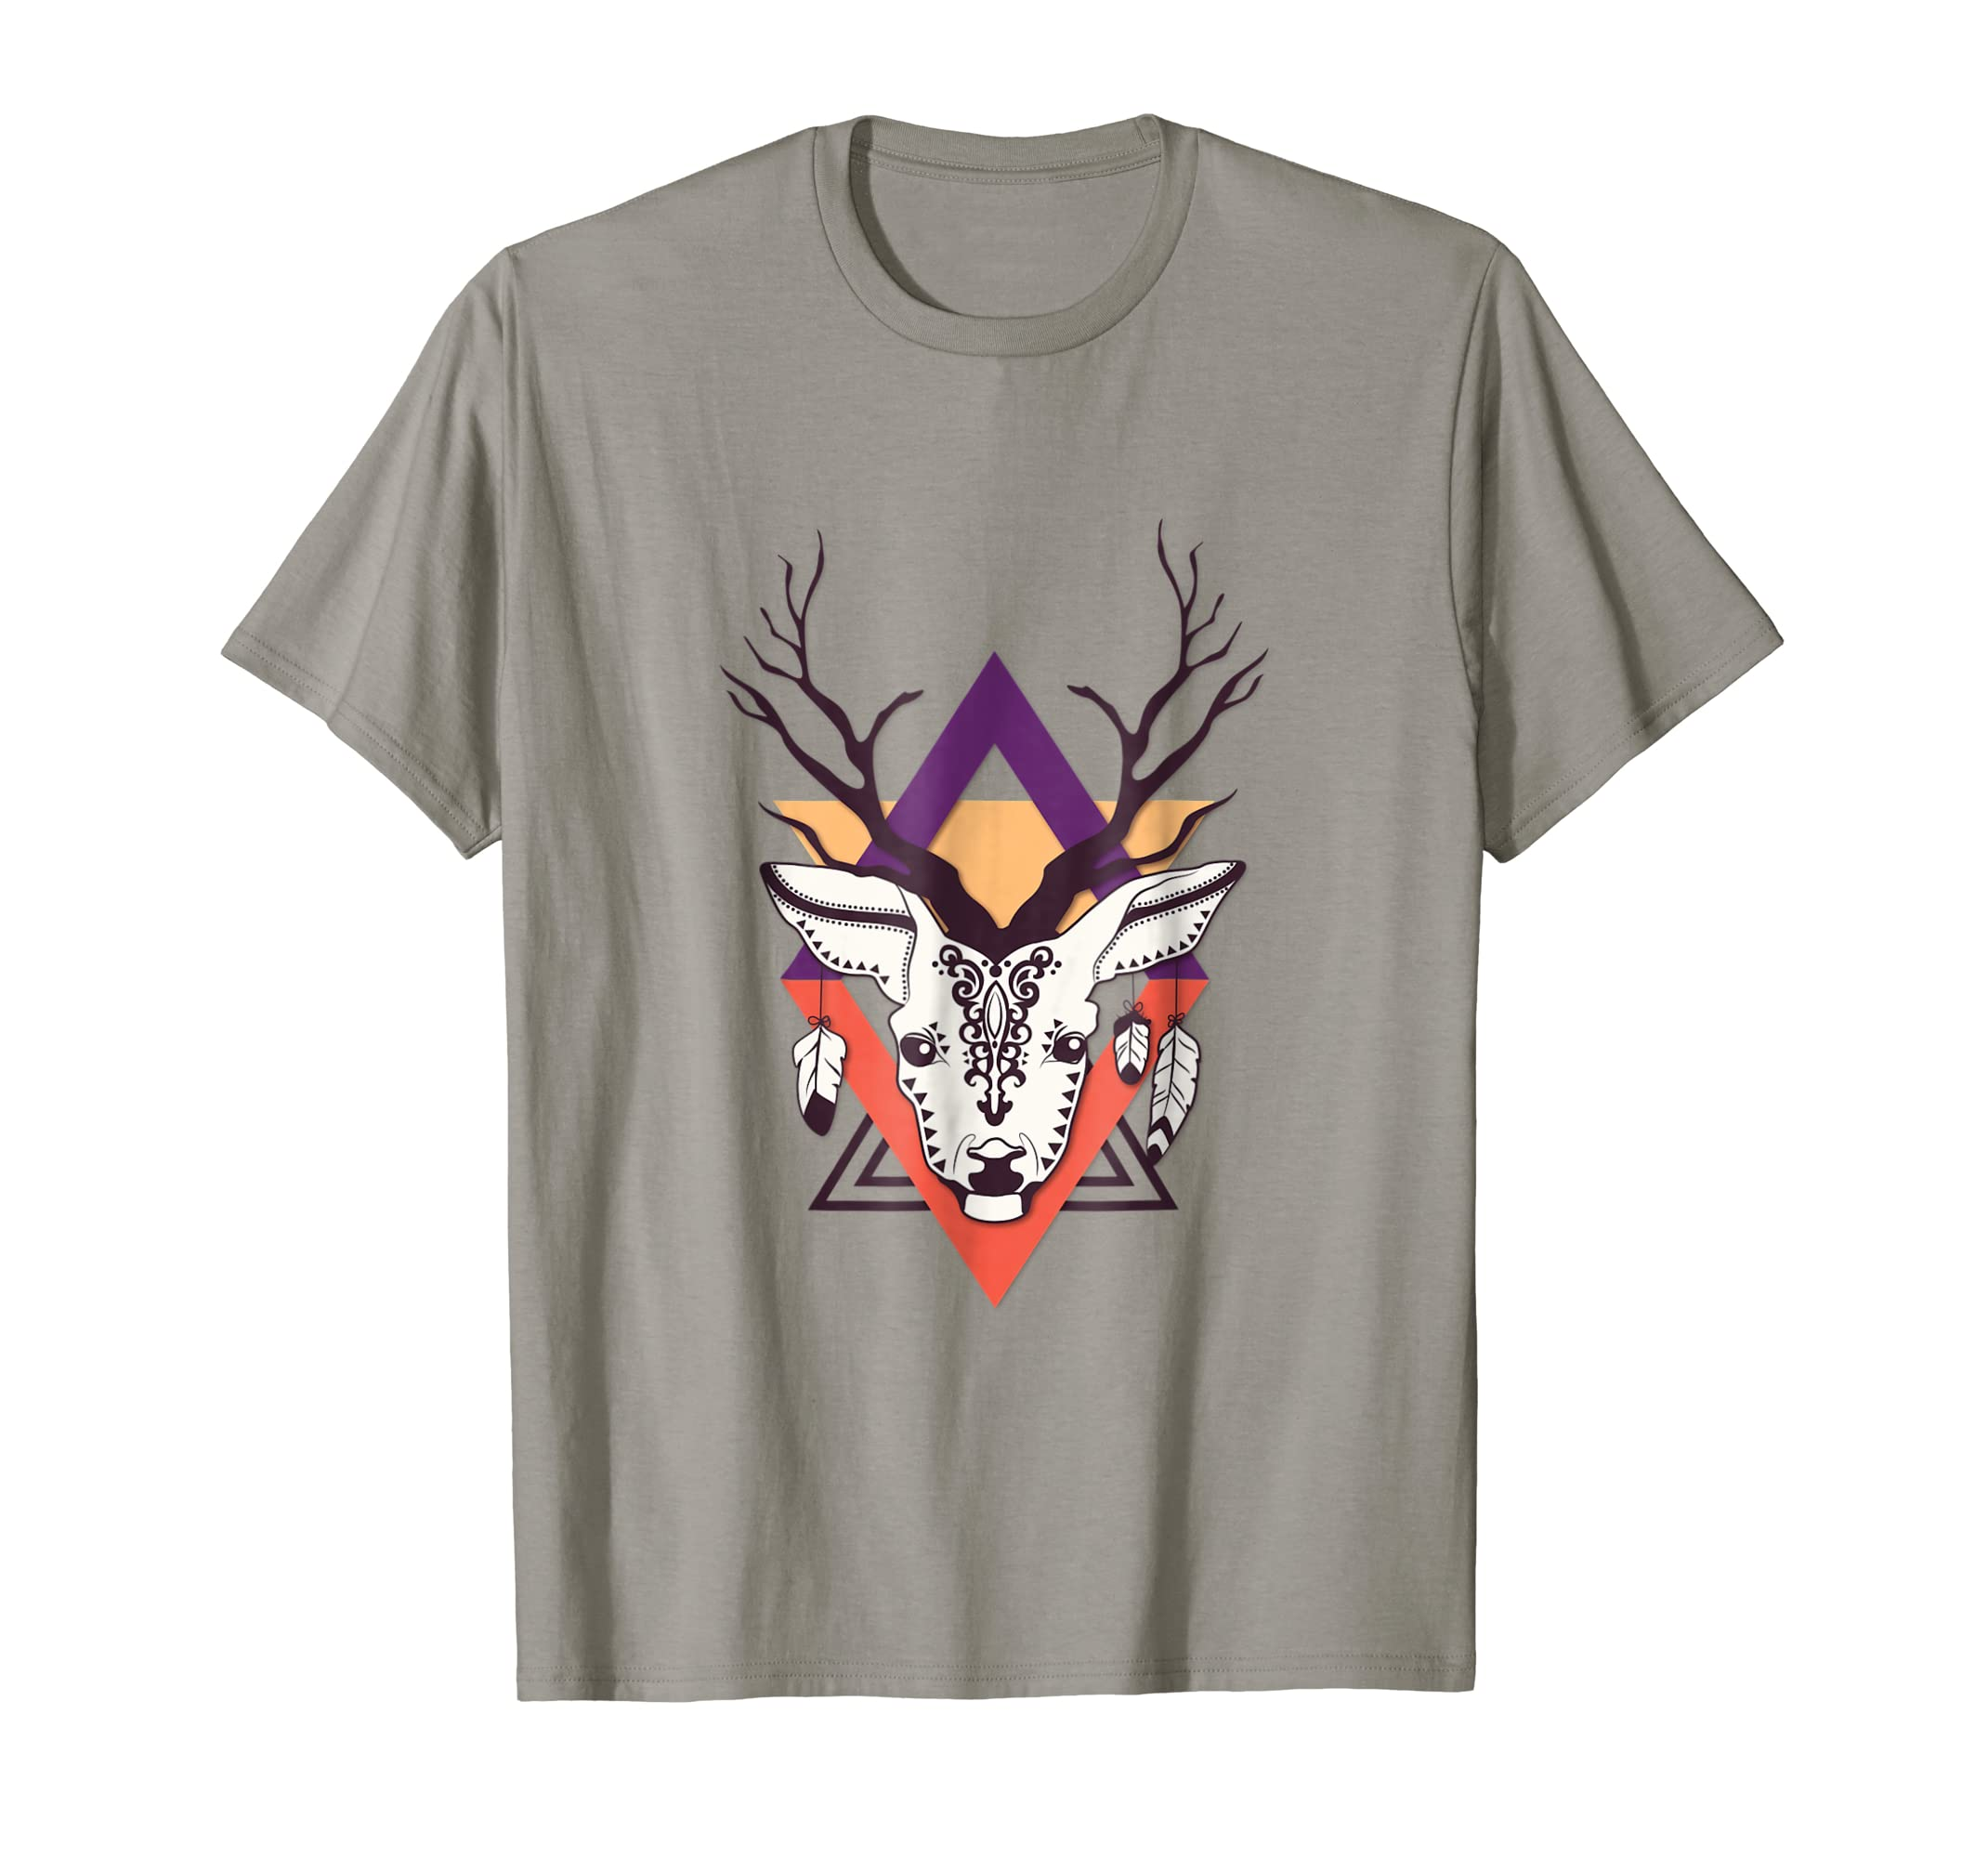 Cool Tshirt Designs India « Alzheimer's Network of Oregon